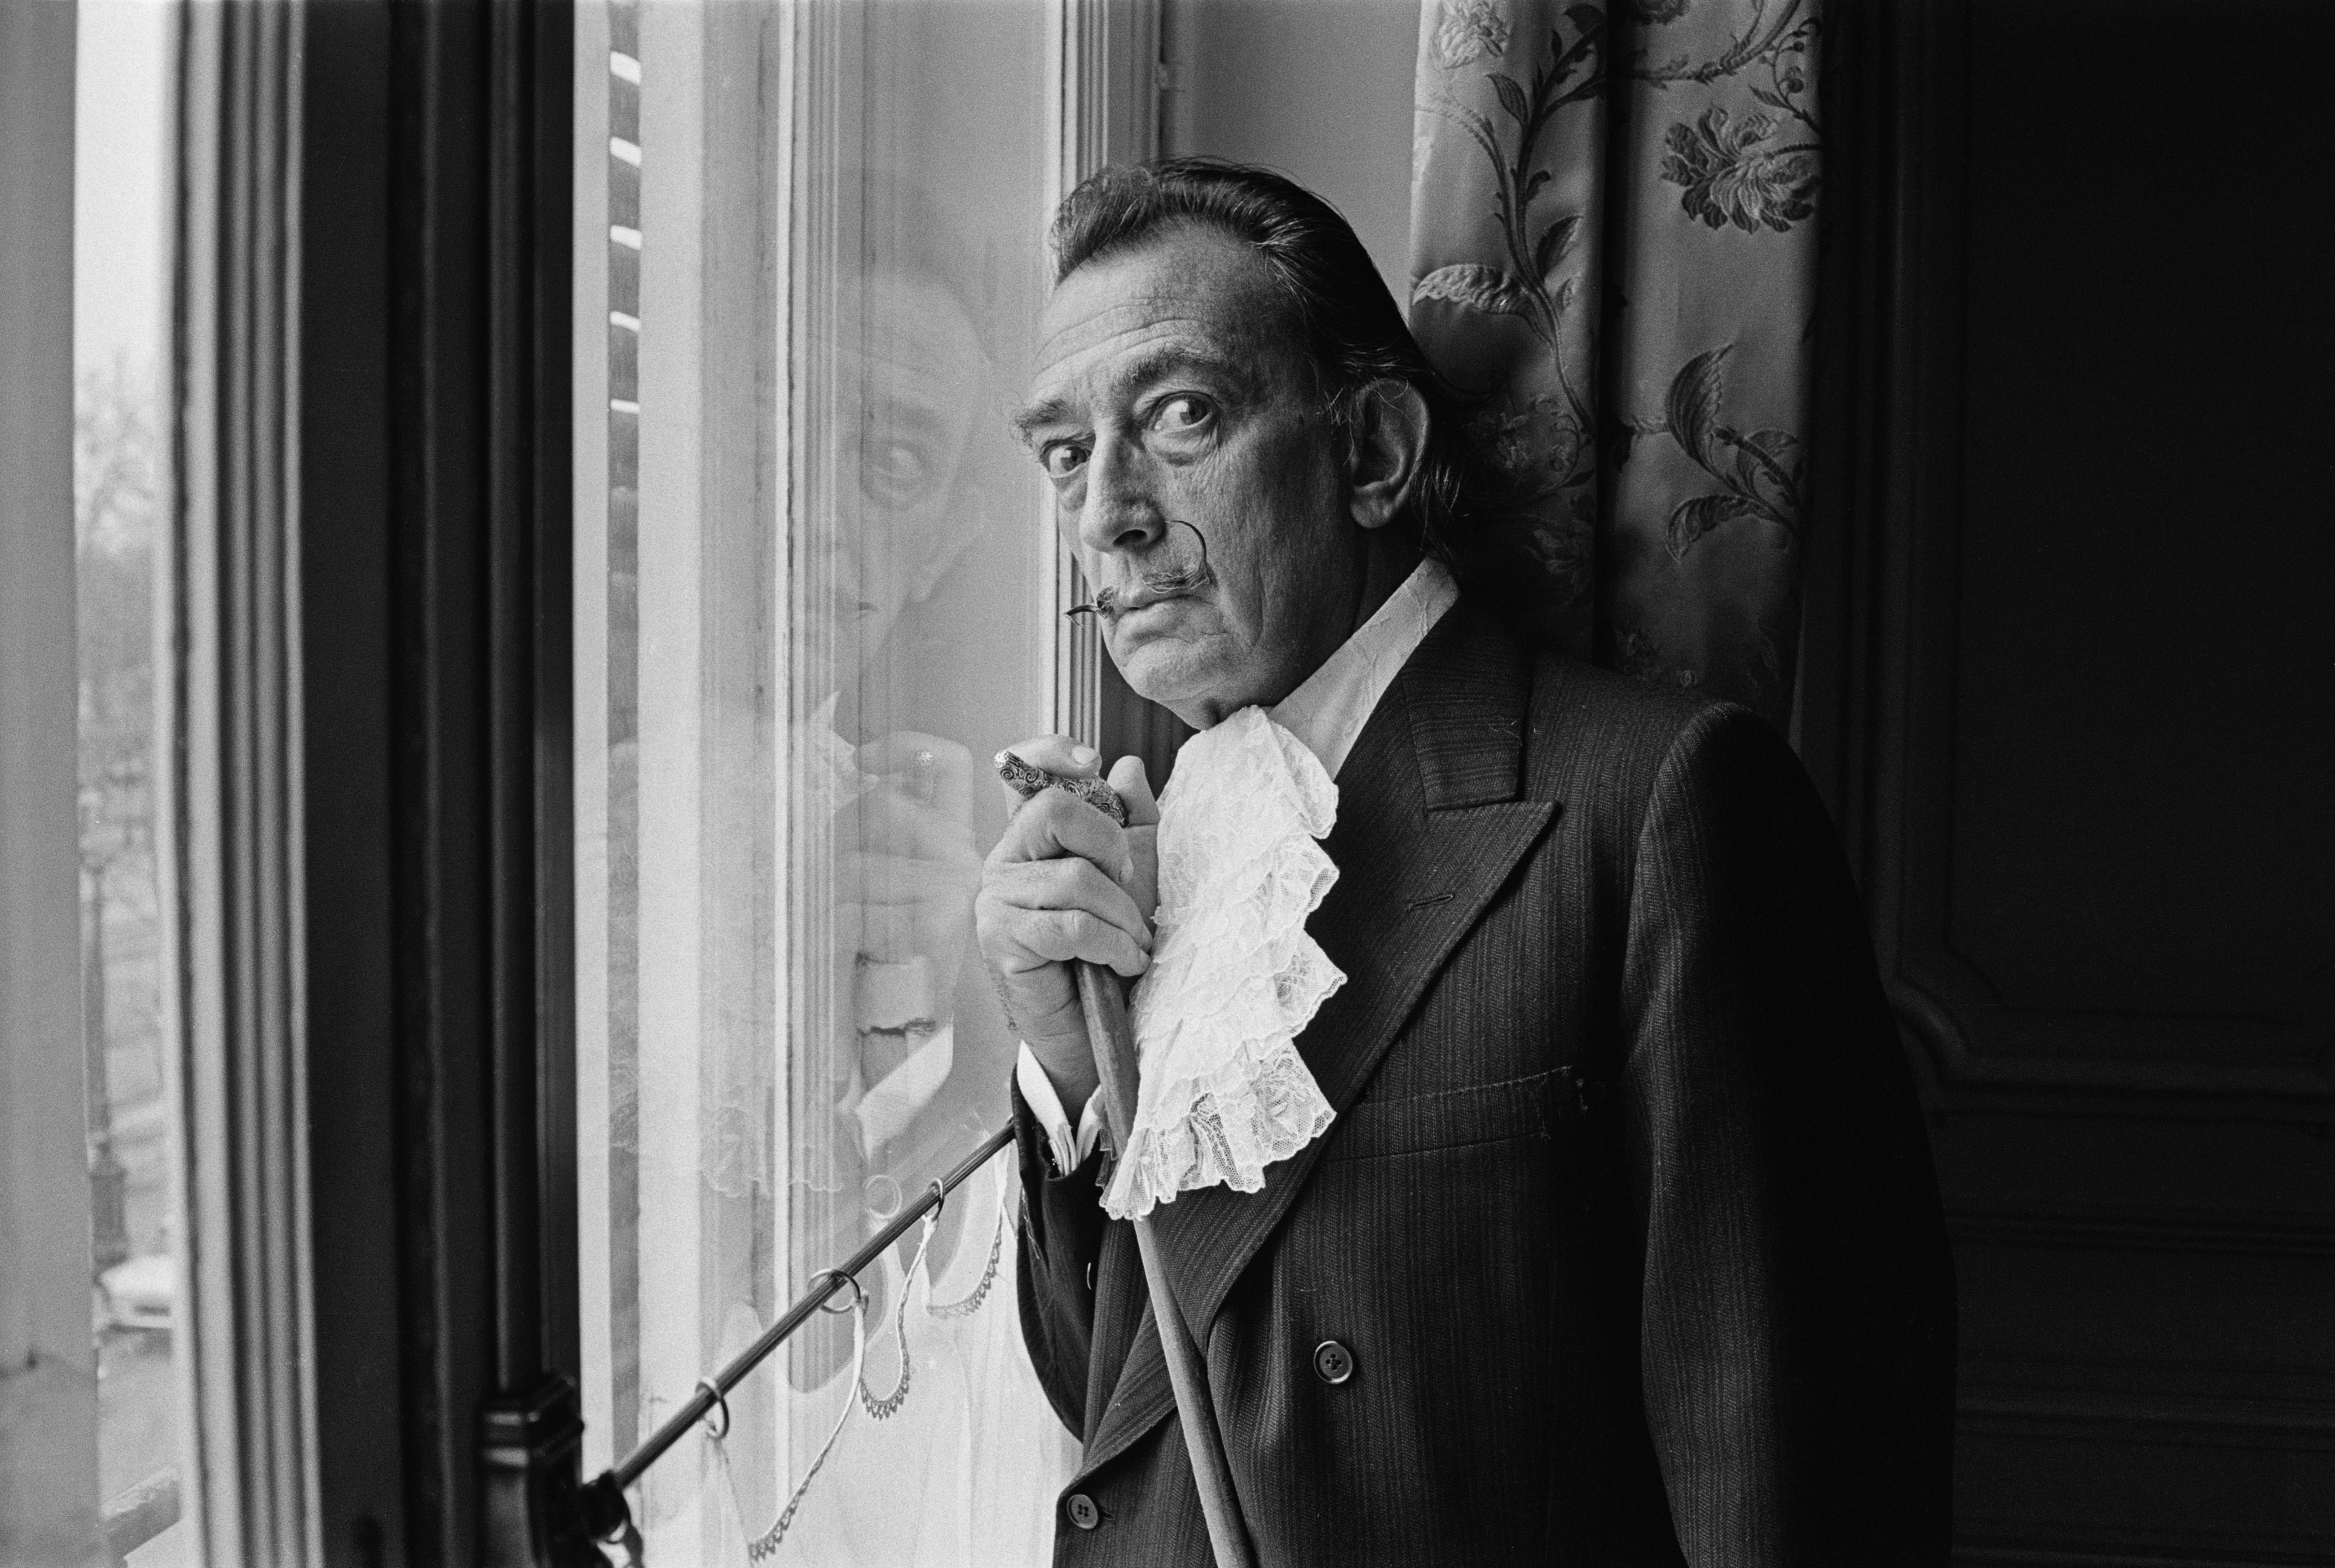 Spanish surrealist painter Salvador Dali (1904 - 1989), 29th December 1964.